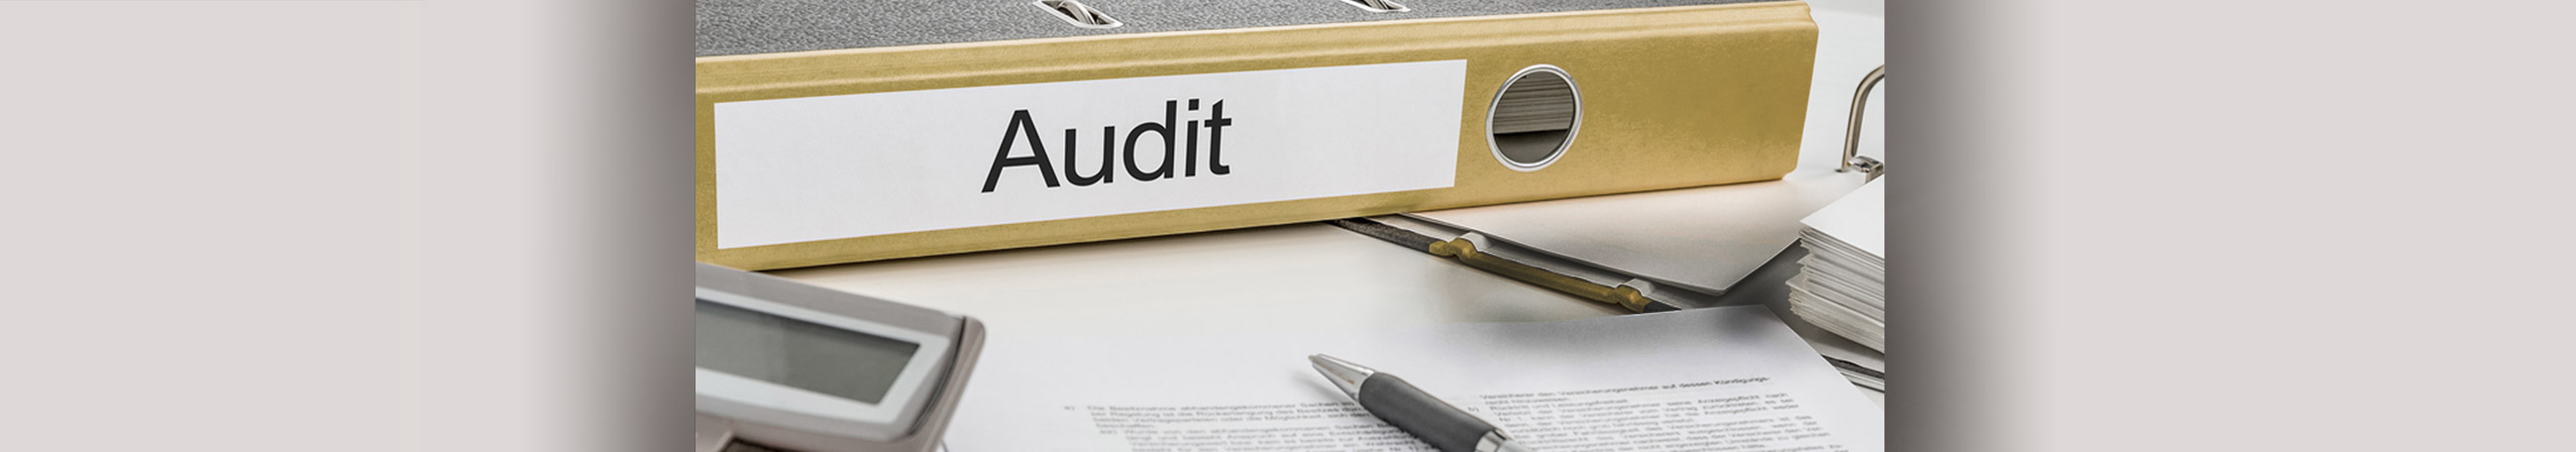 slider-bg-1-audits